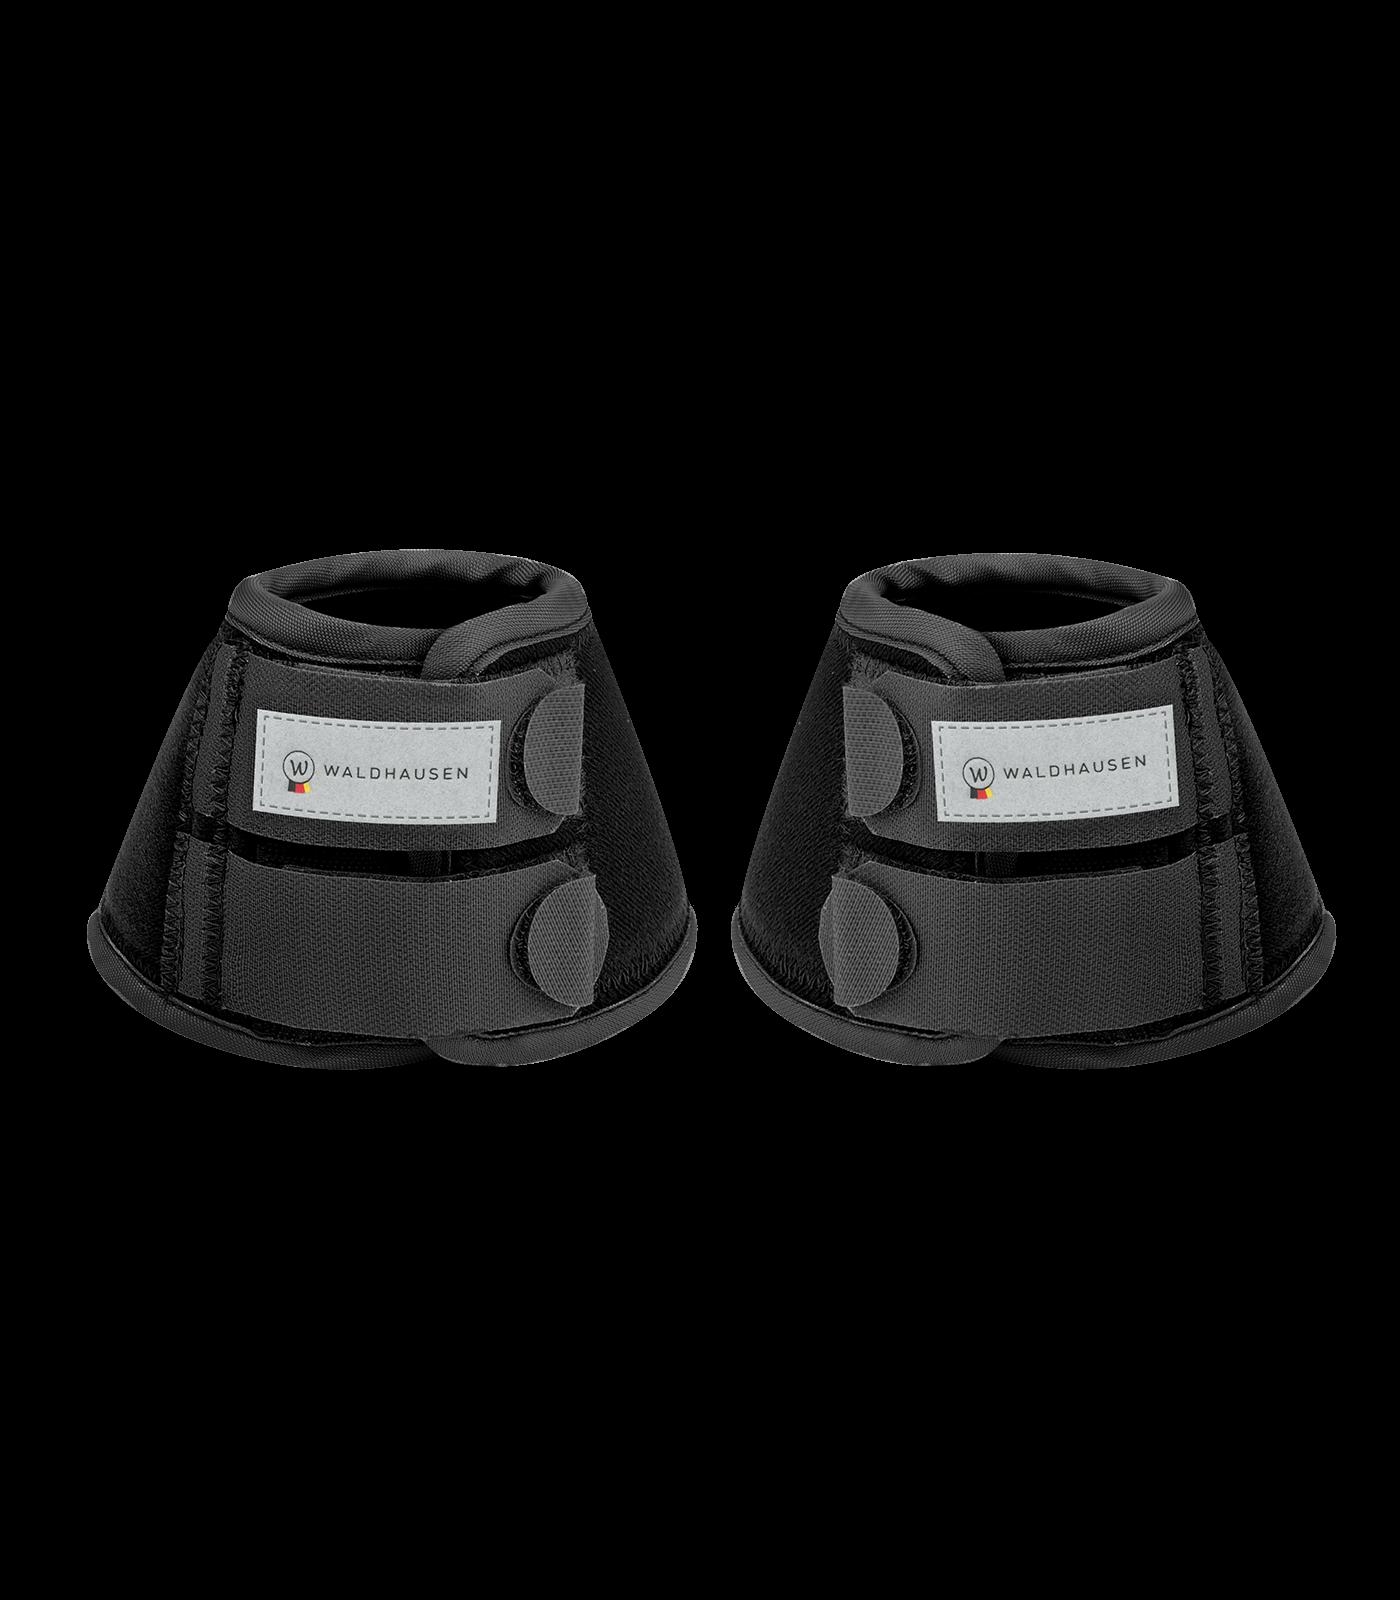 WALDHUASEN clochen protect bell boots pair black